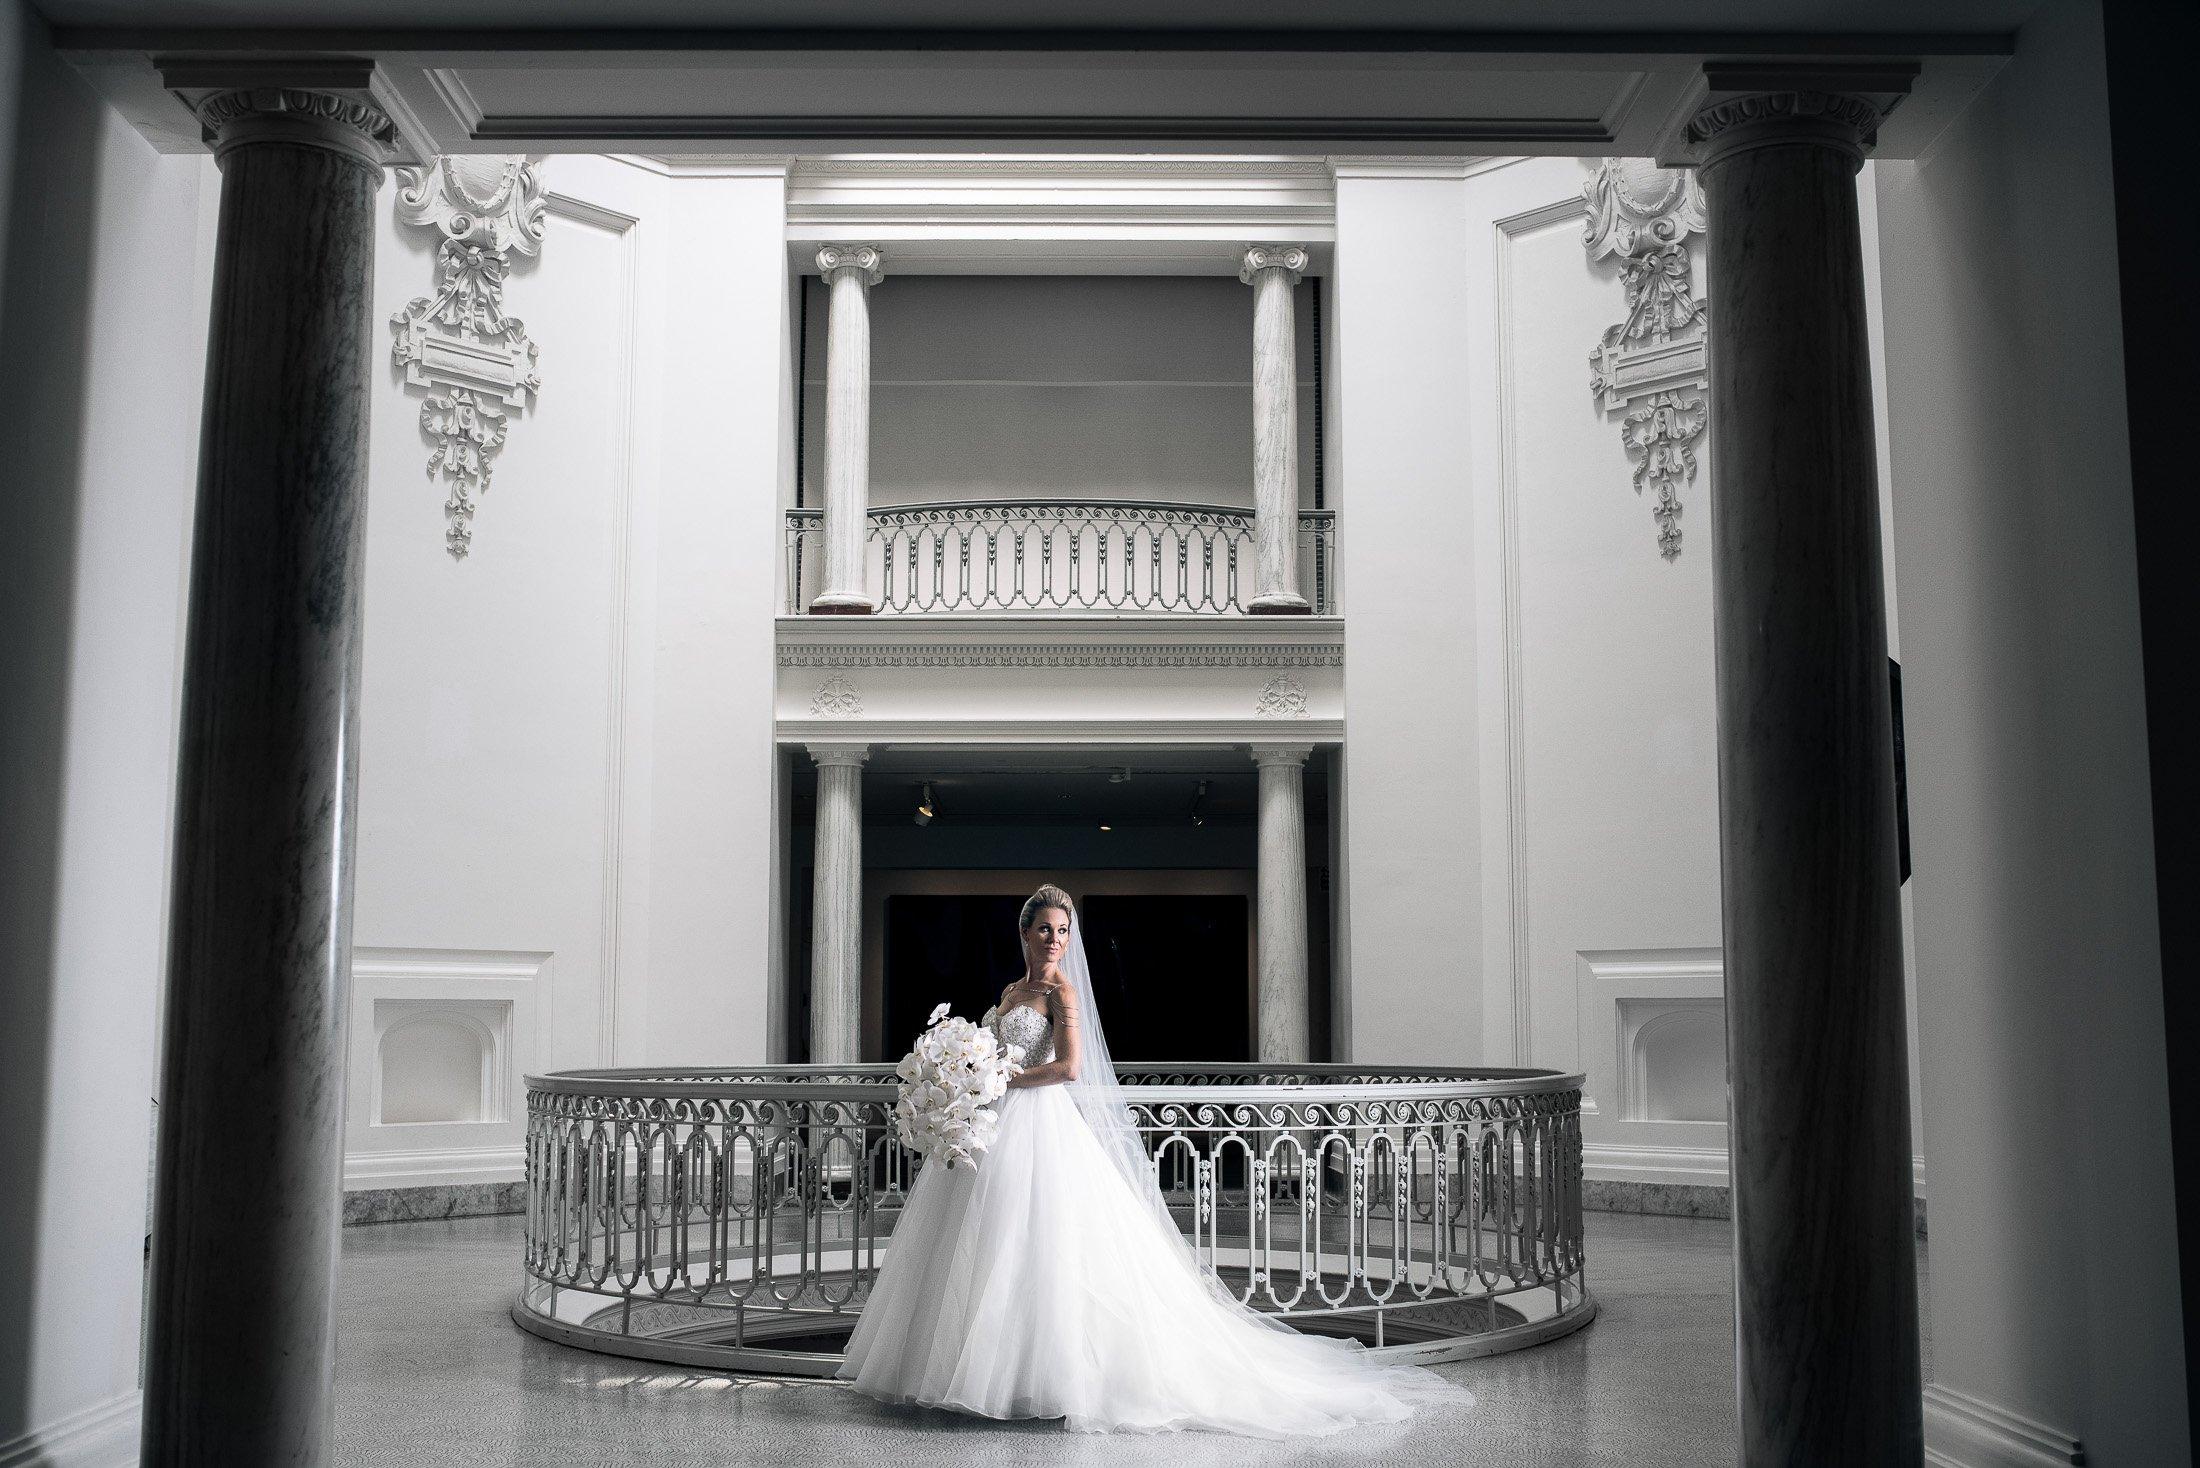 Vancouver Photoshoot Locations Art Gallery Wedding